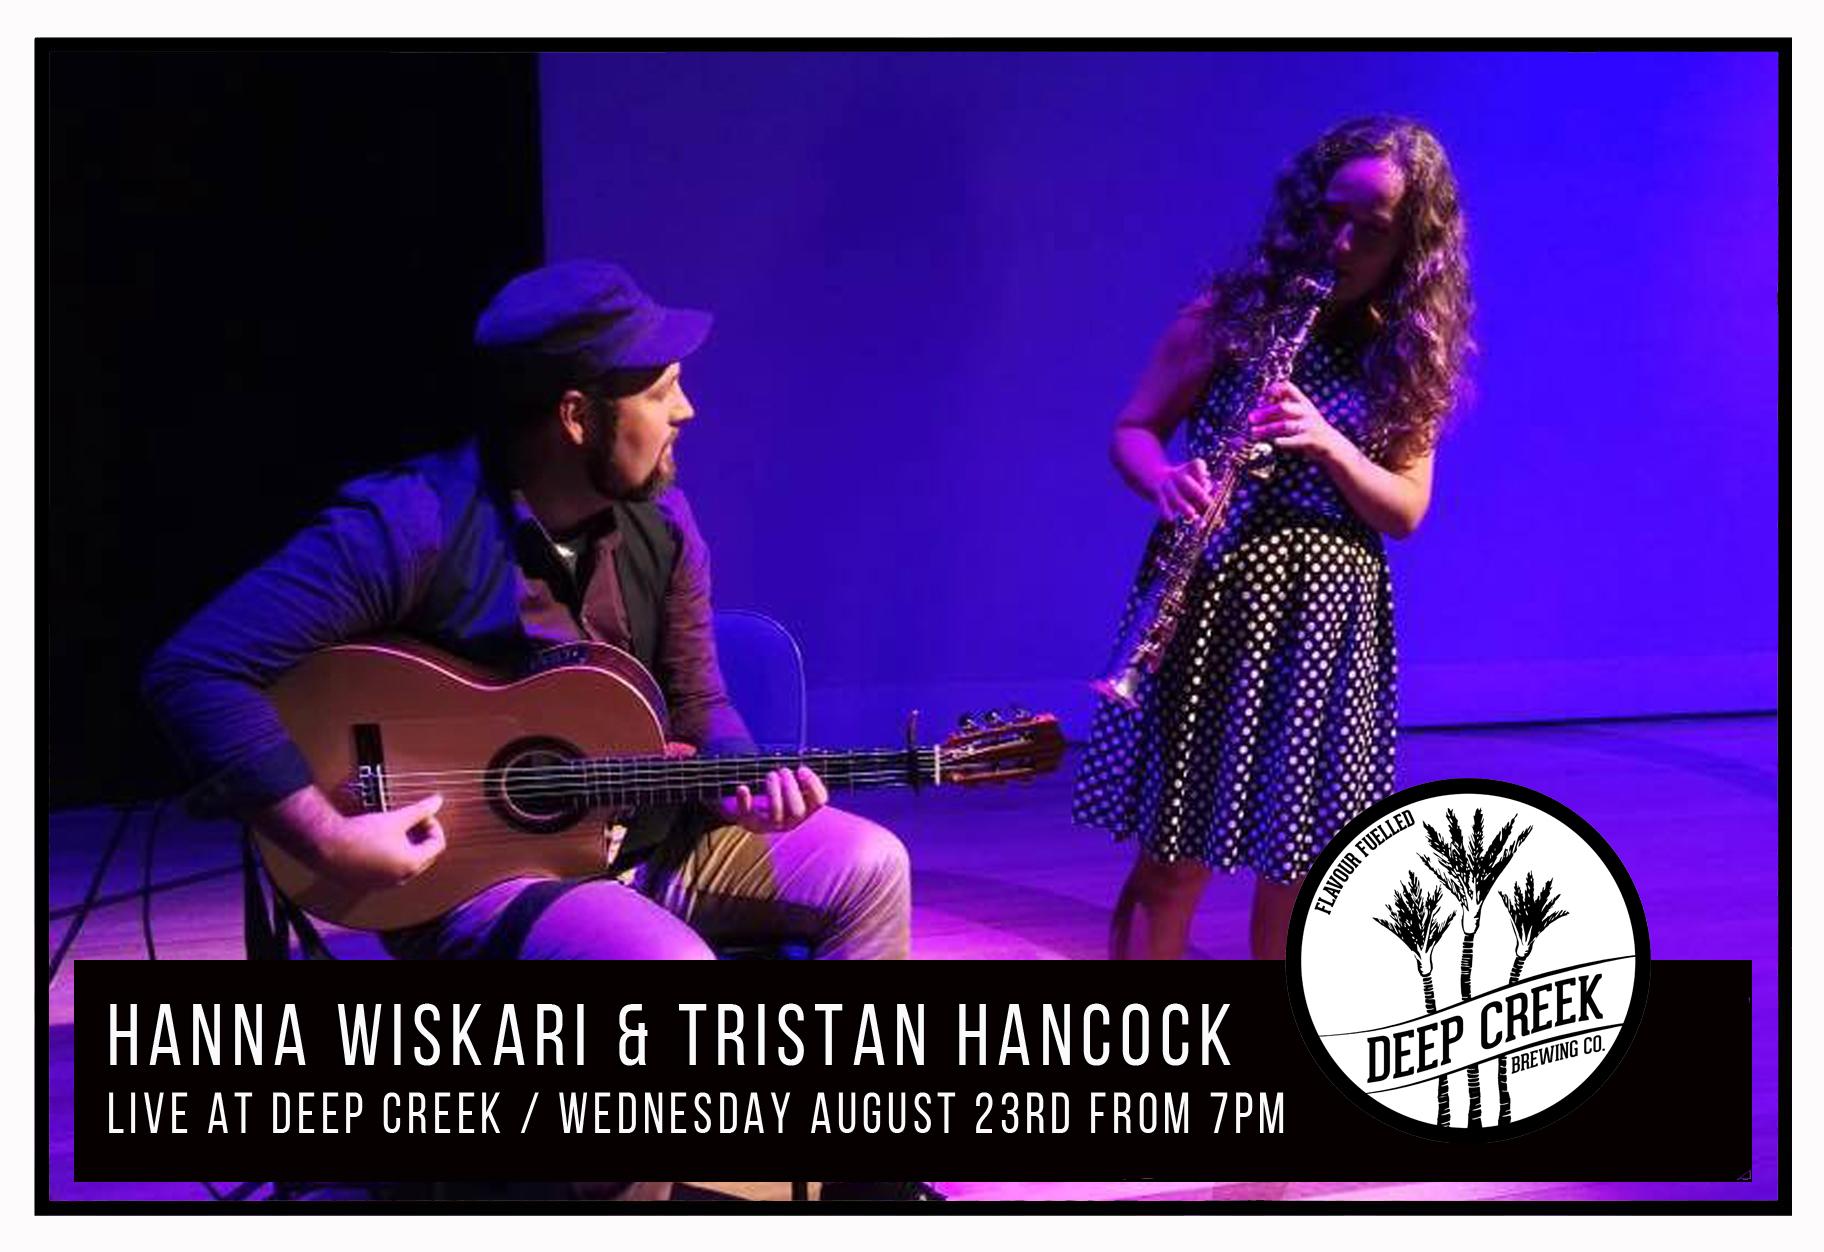 Hanna Wiskari And Tristan Hancock